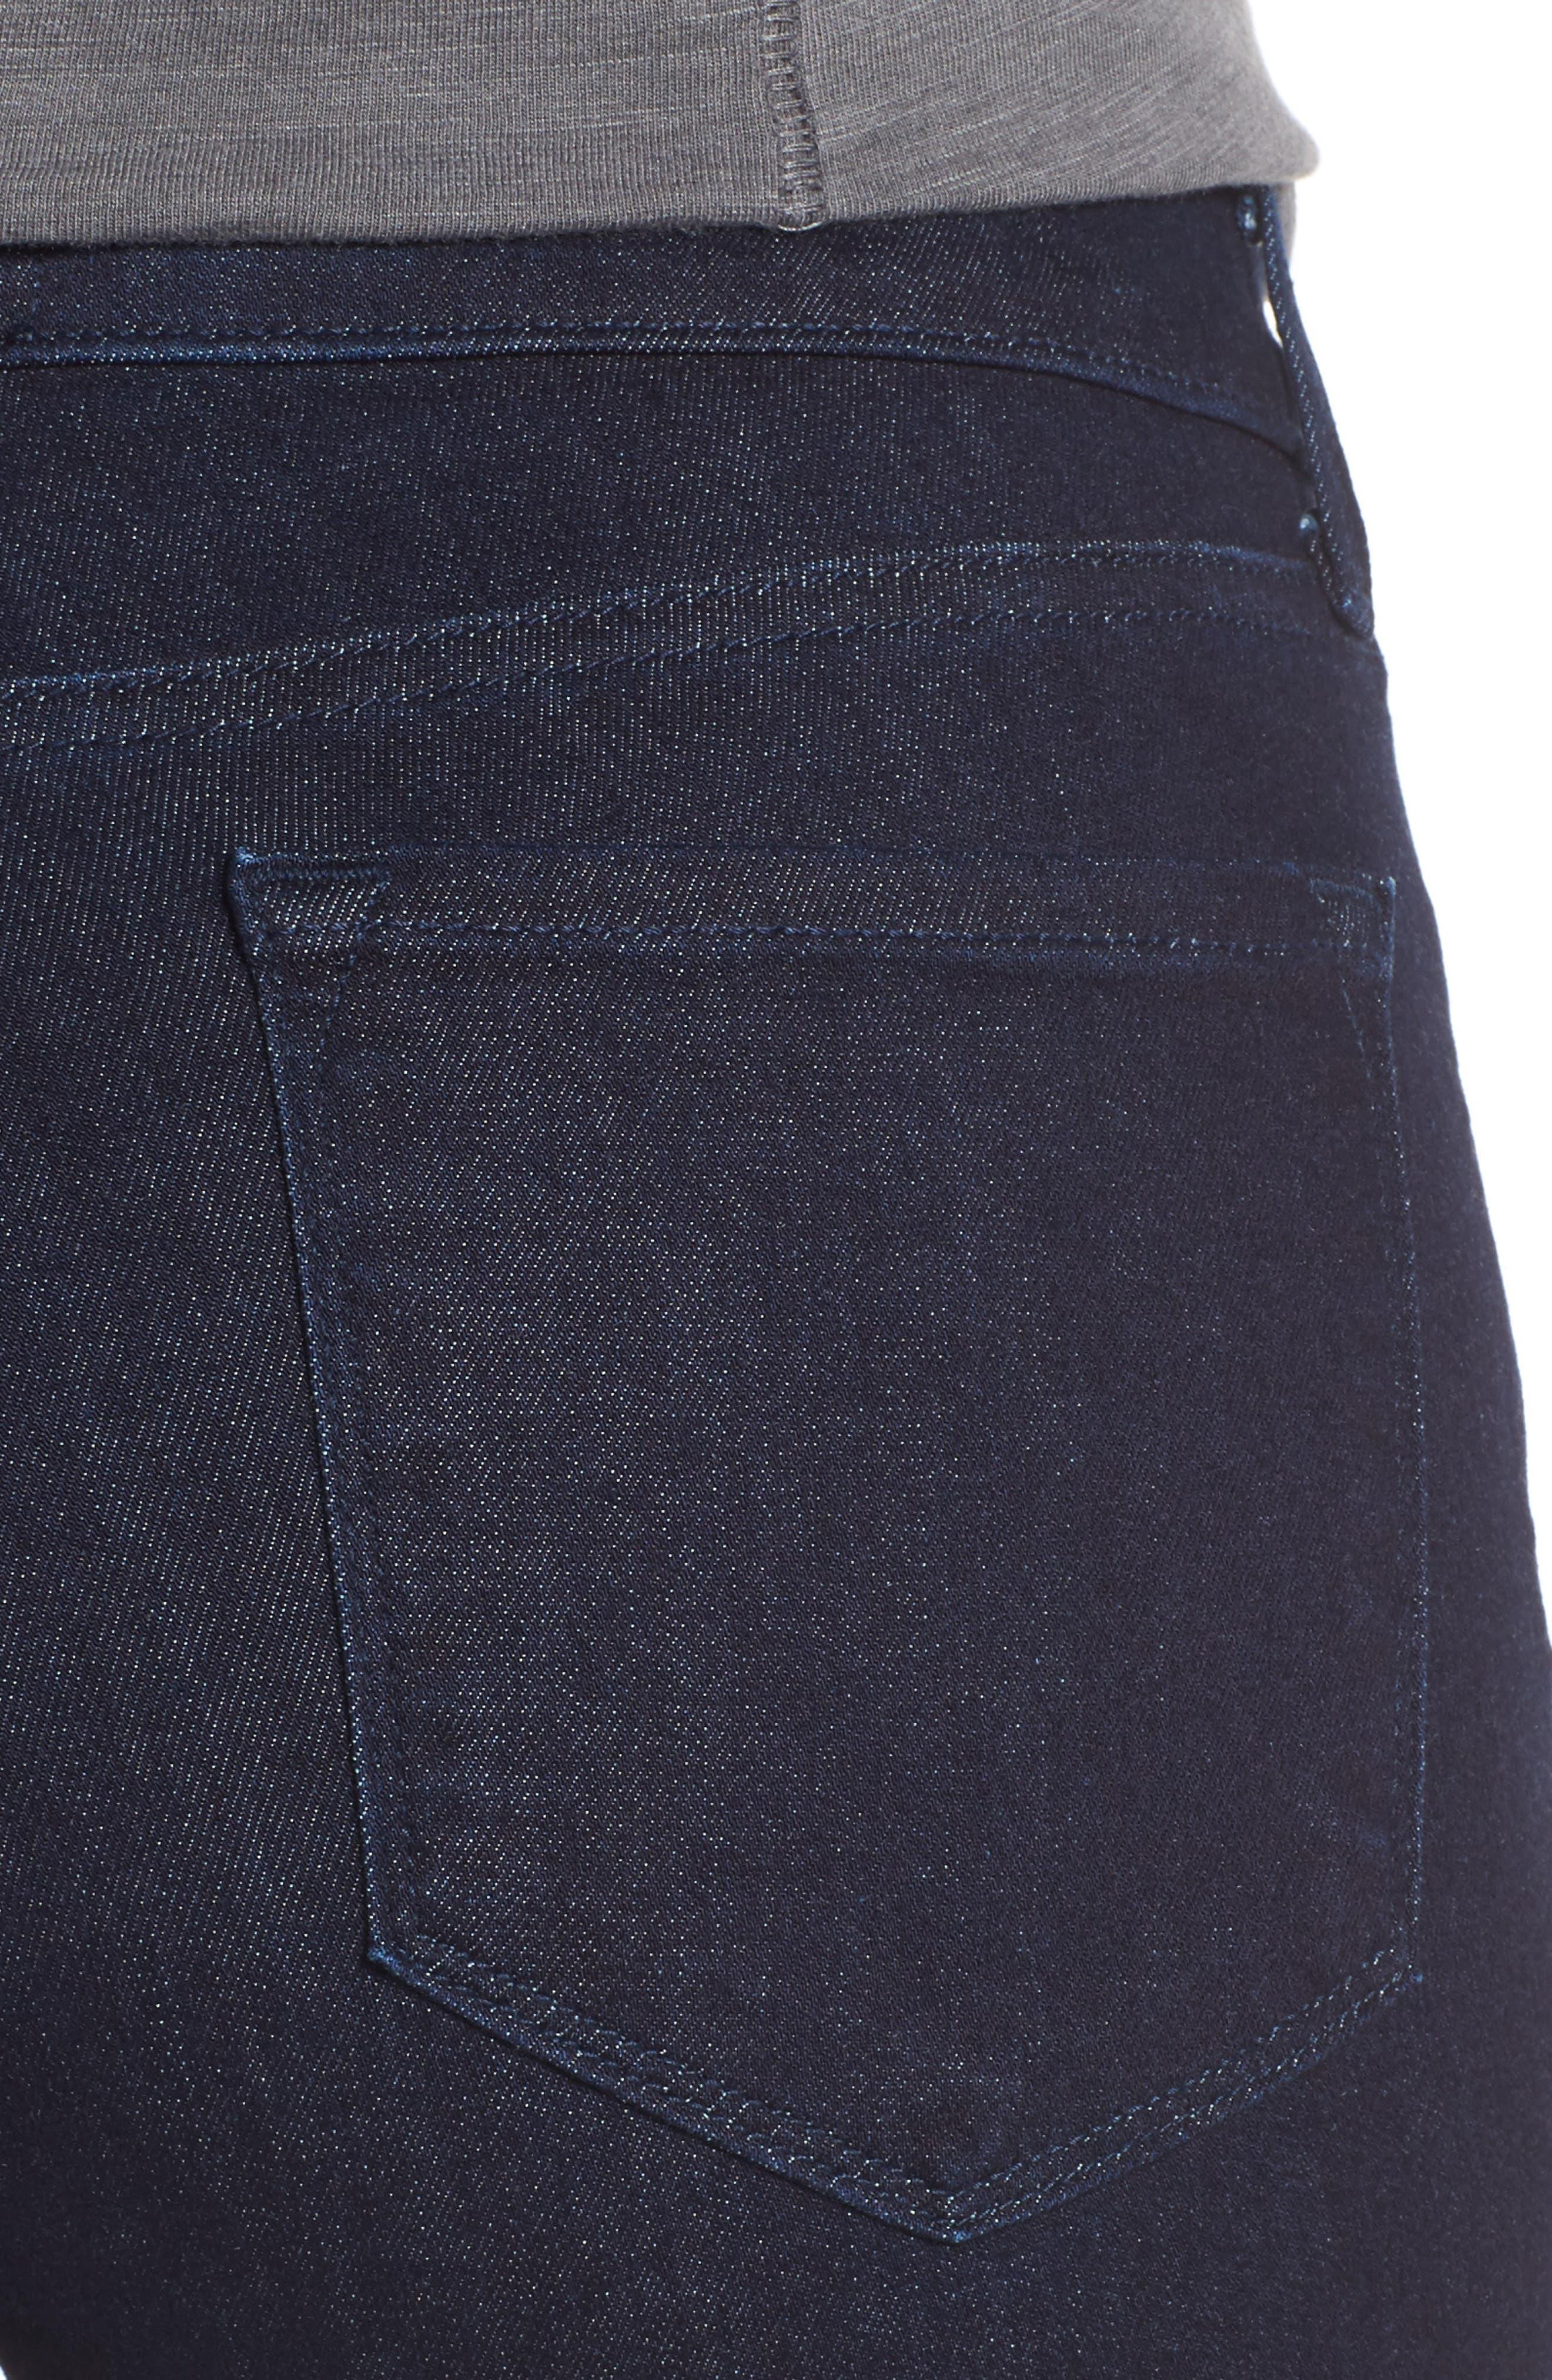 NYDJ,                             Marilyn Straight Leg Jeans,                             Alternate thumbnail 4, color,                             408